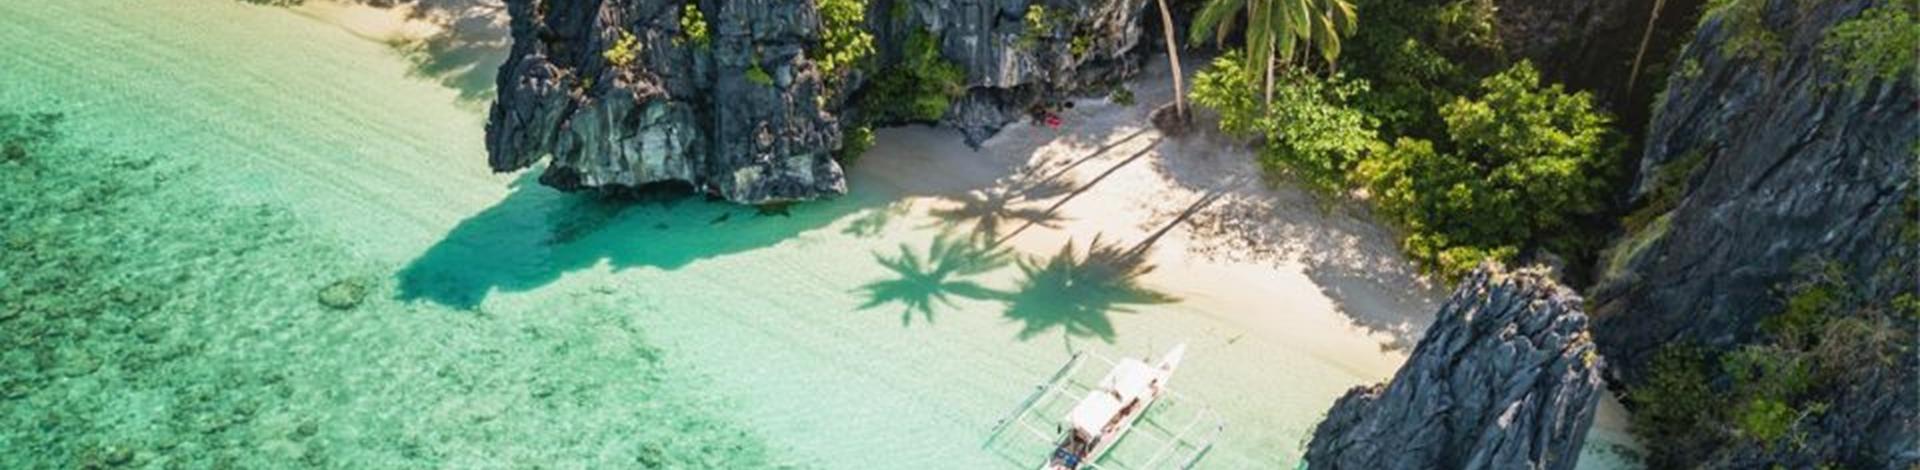 Zamboanguita